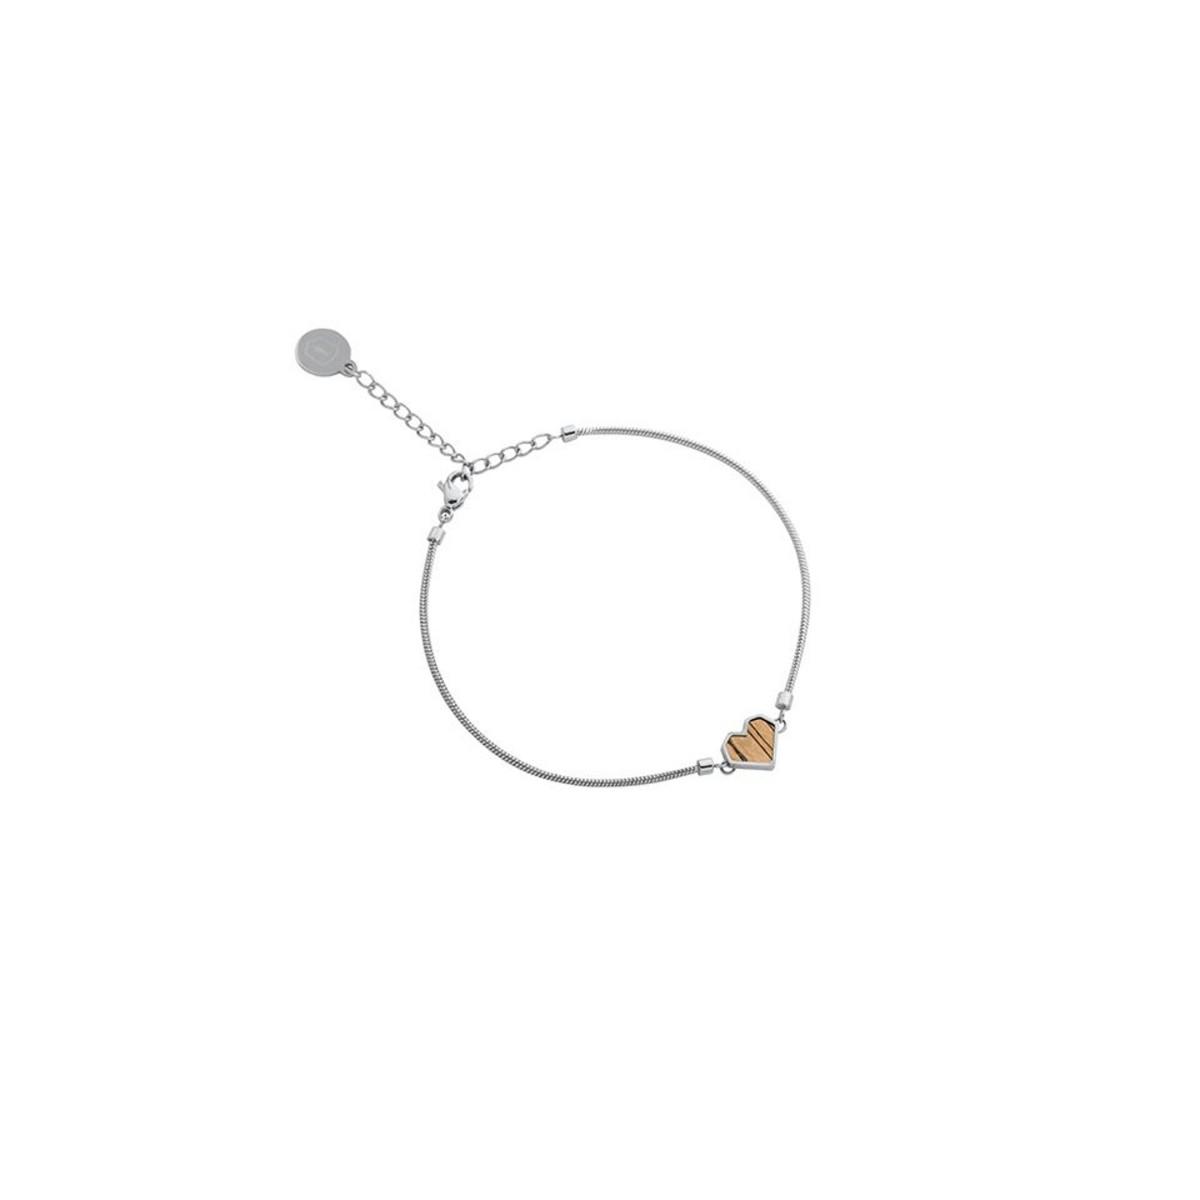 "BeWooden Armband mit Holzdetail - Motiv Herz - ""Lini Bracelet Heart"""